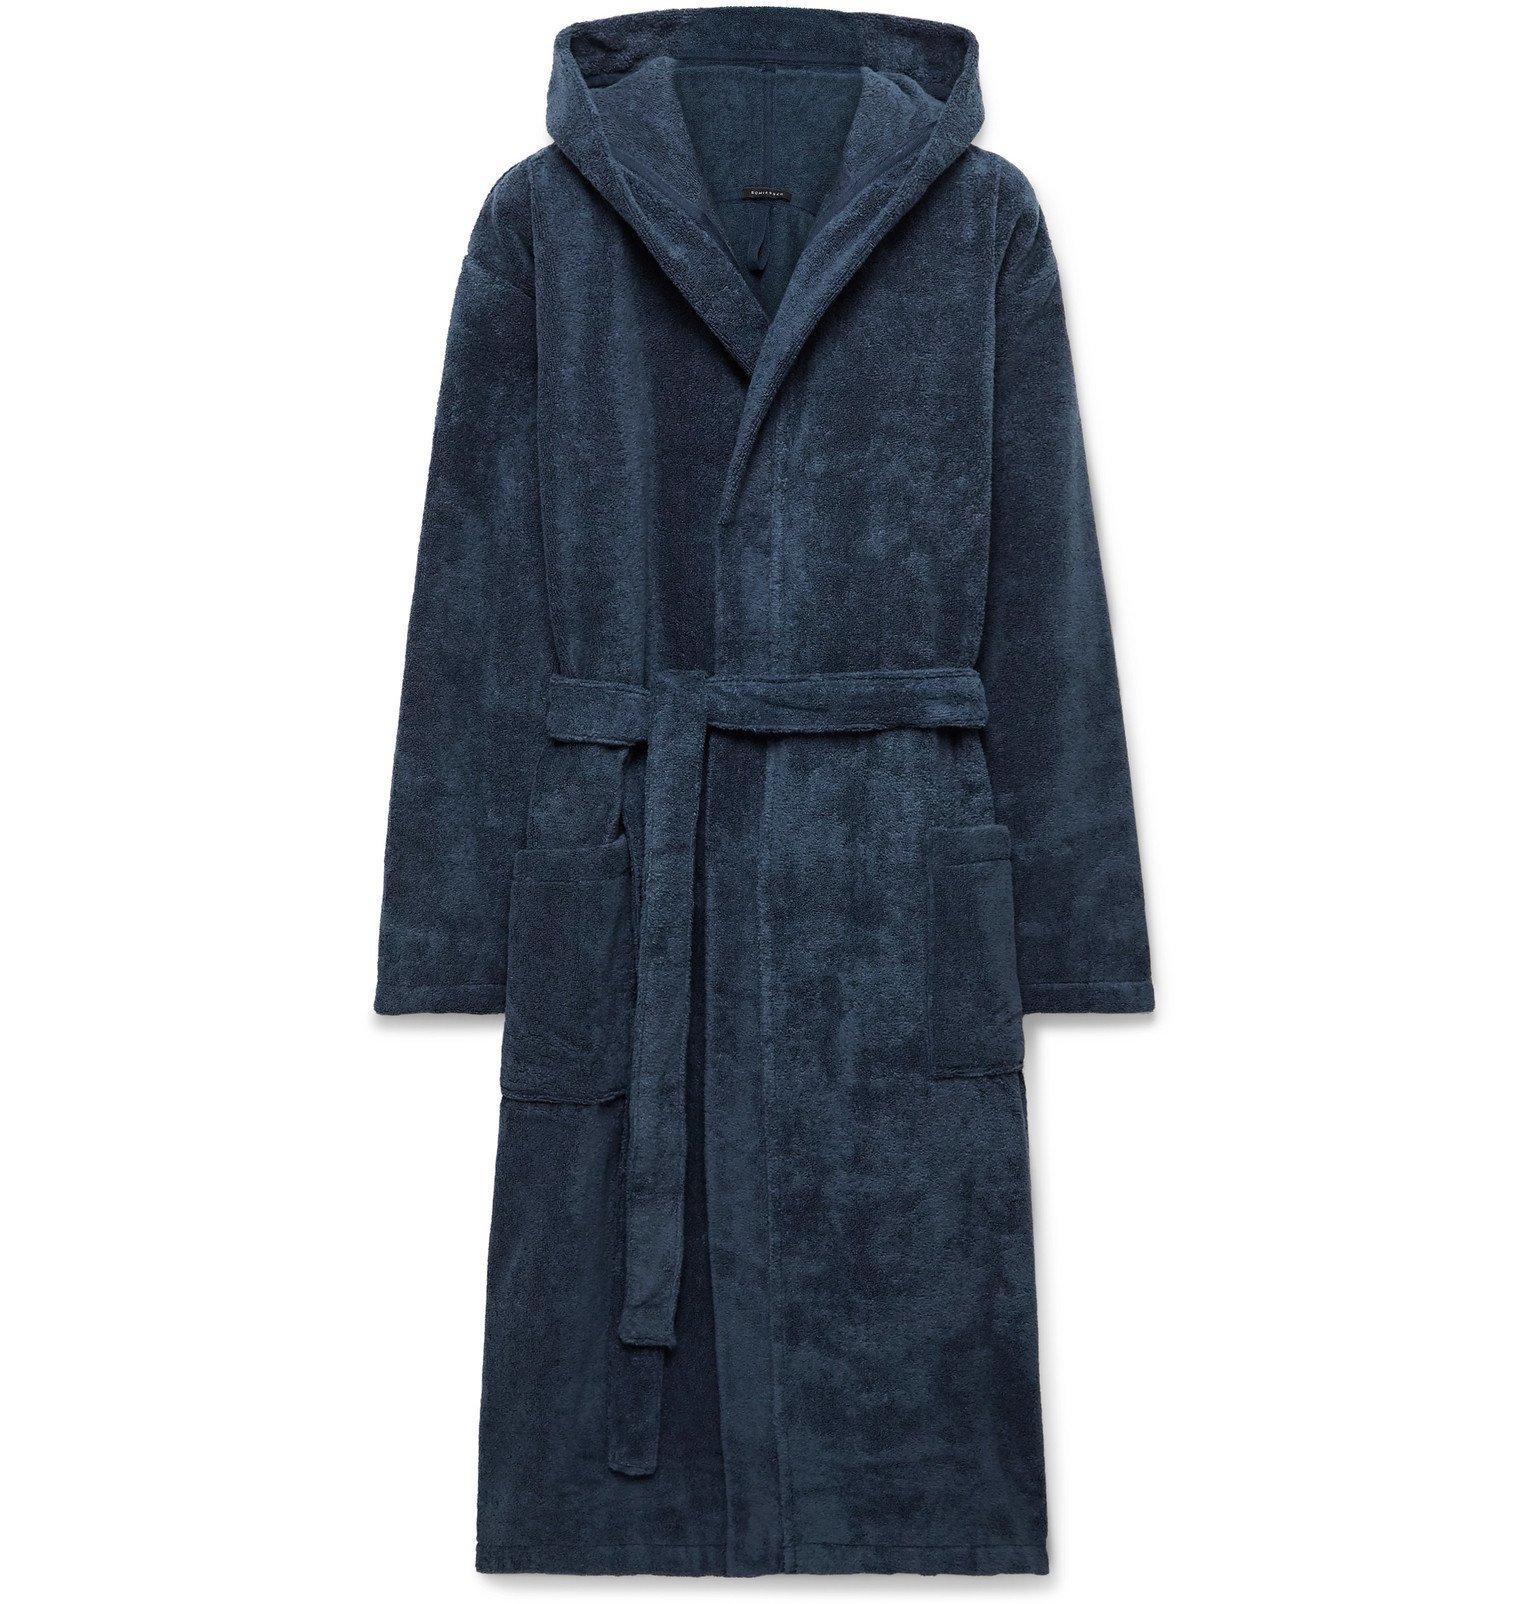 Schiesser - Cotton-Terry Hooded Robe - Blue